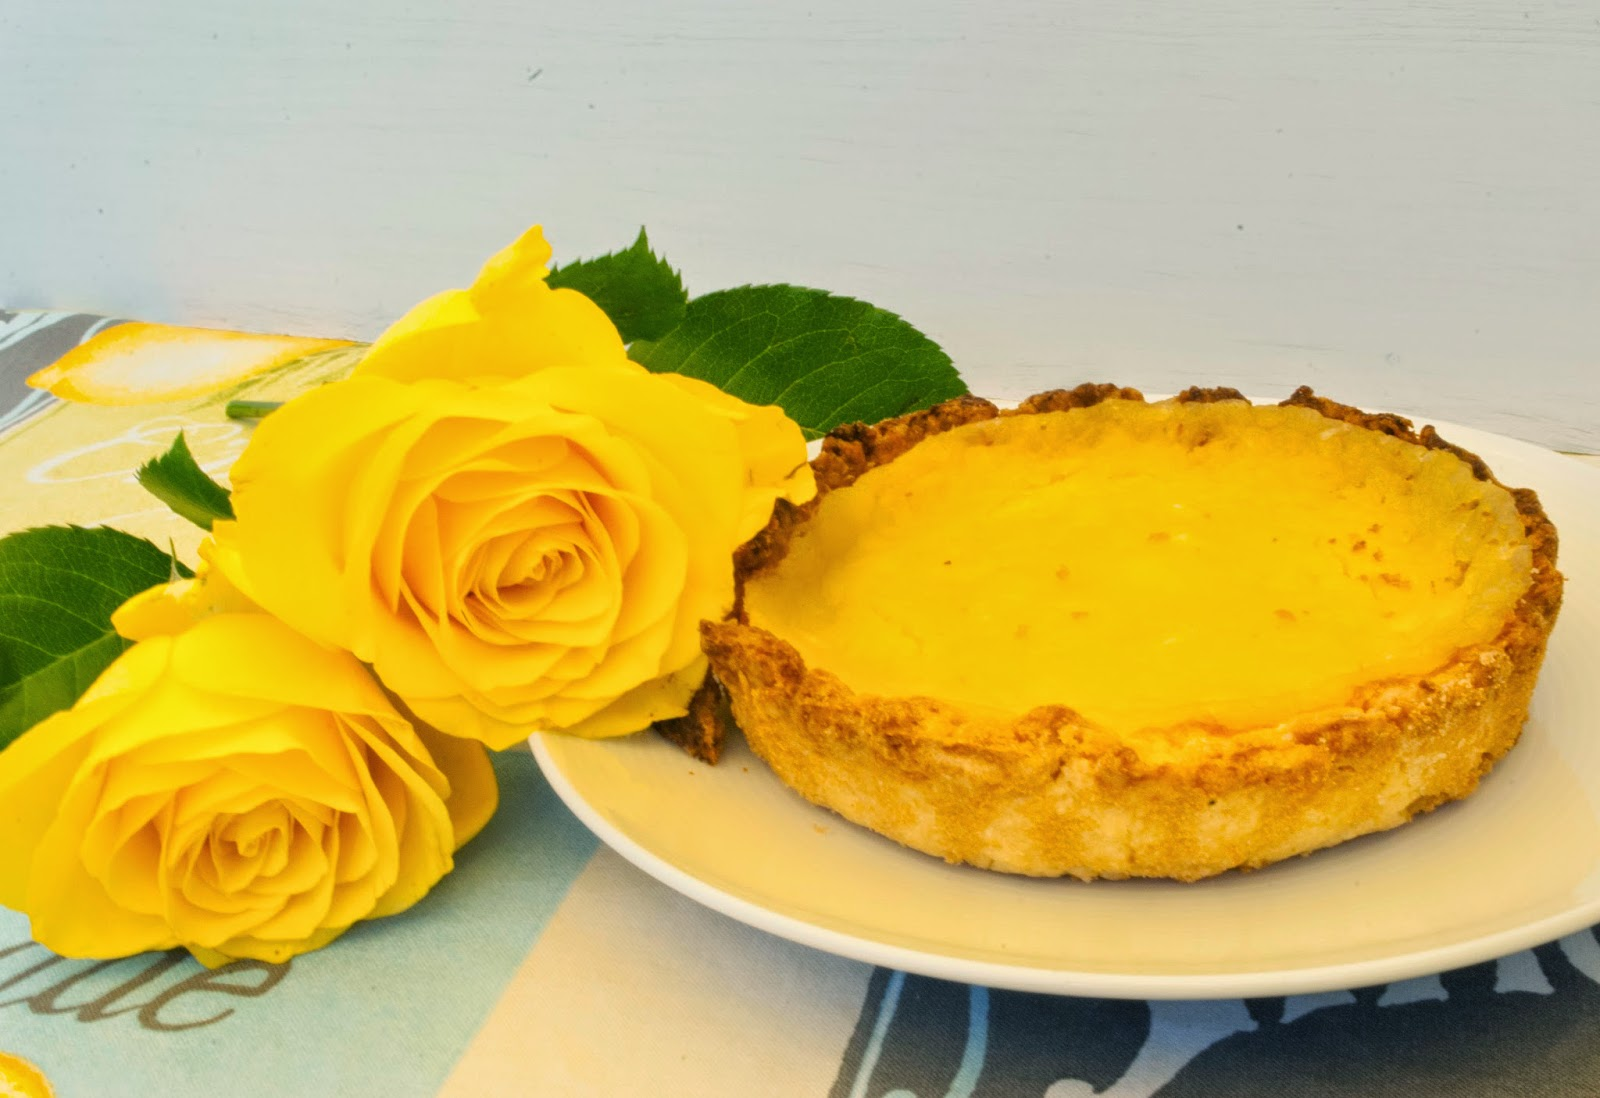 Lemon Curd Tarte Backen Kuchen Tarte Torte Lecker backfreak Küche Kochen zitrone Citrus Zitrus Sommer Geburtstag Geschenk Gelb Hupsis Serendipity